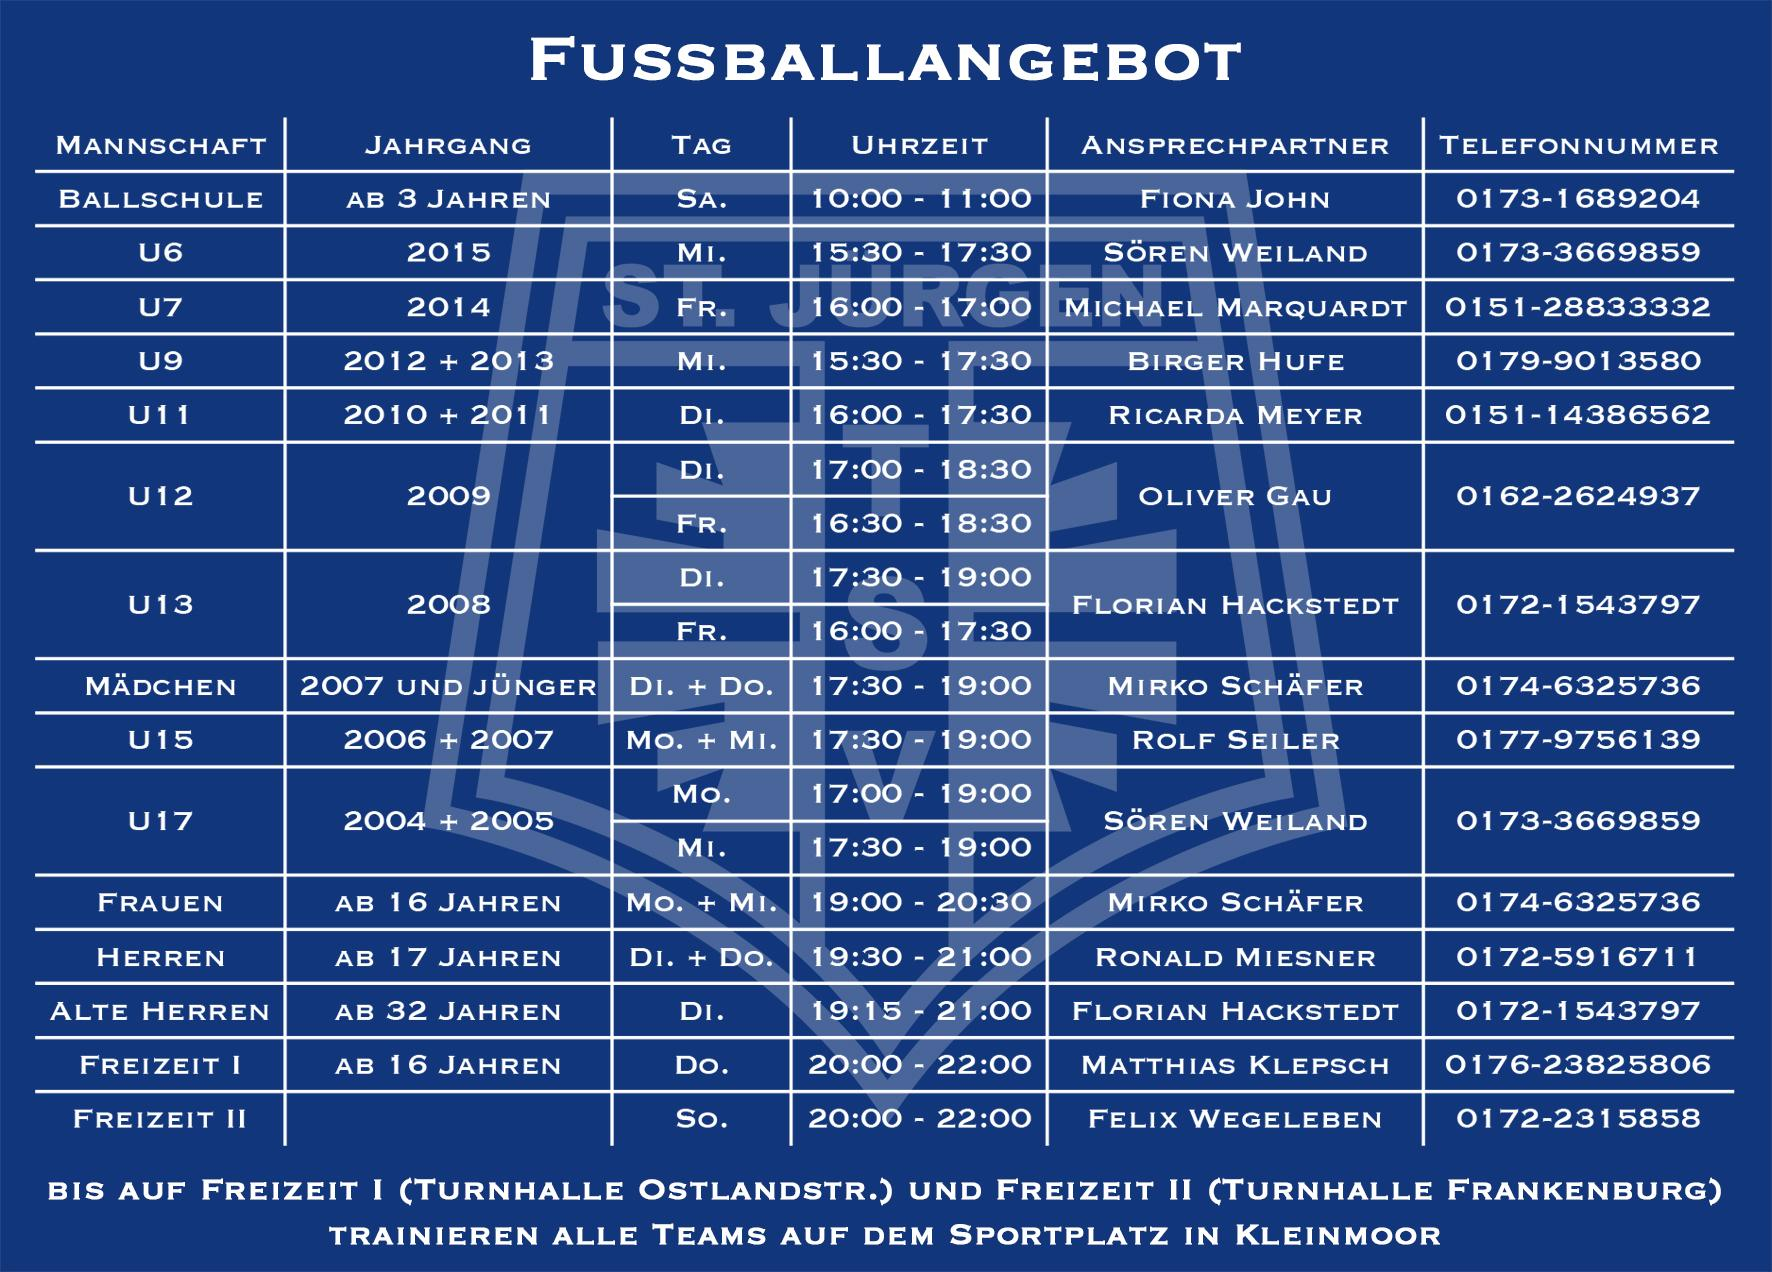 Fussballangebot202010